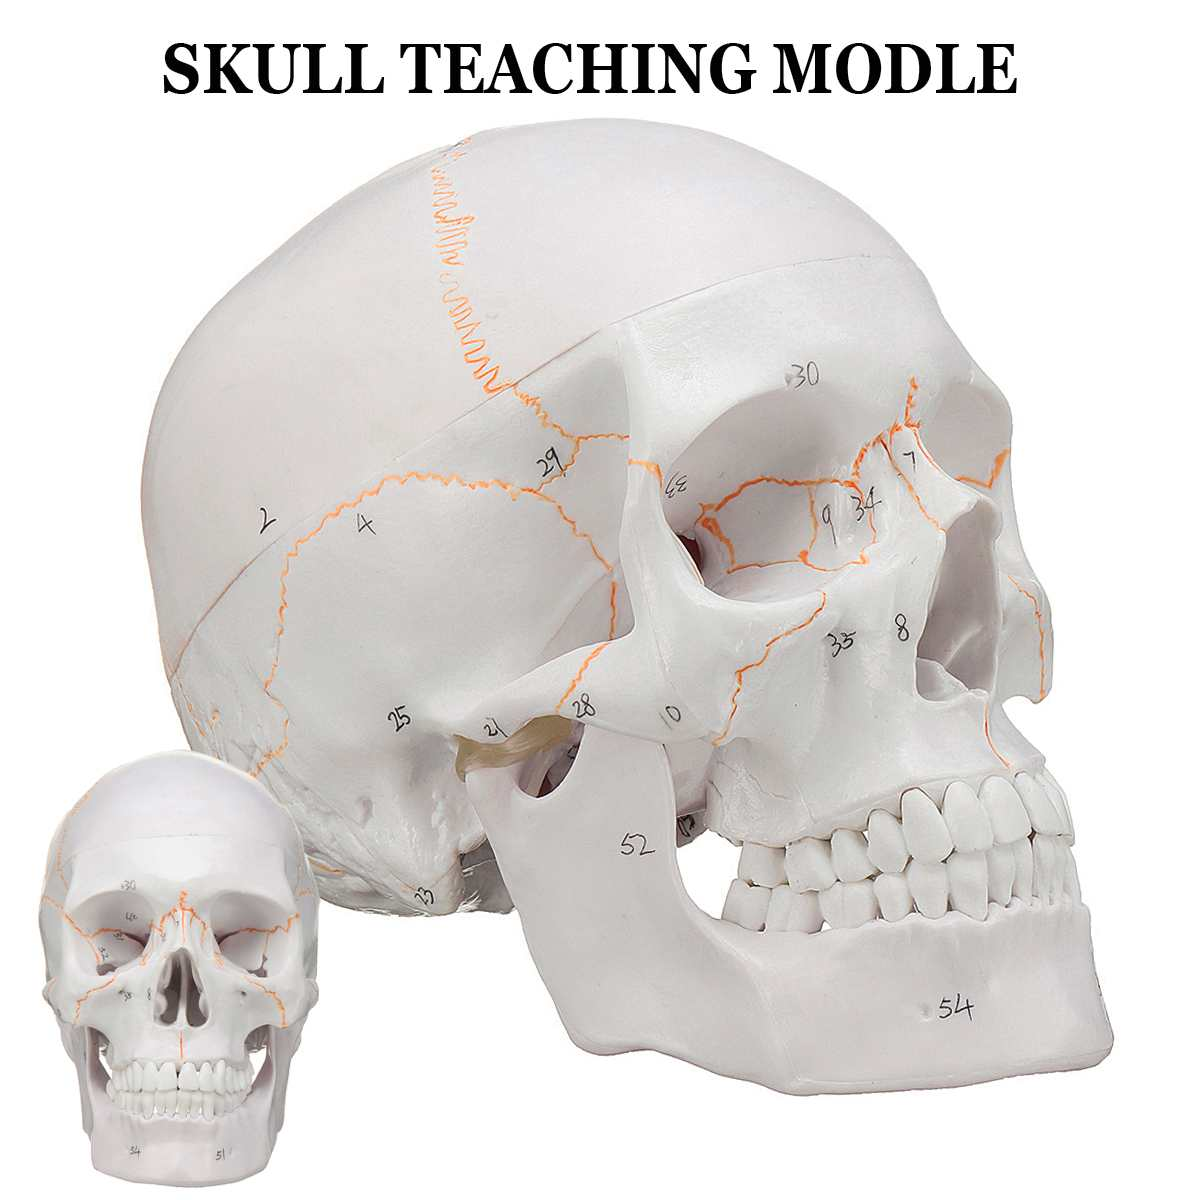 Head Skull Skeleton Model 1:1 Life size Skull Medical Science for School Teaching Human Anatomy Precise Adult Head Medical Model